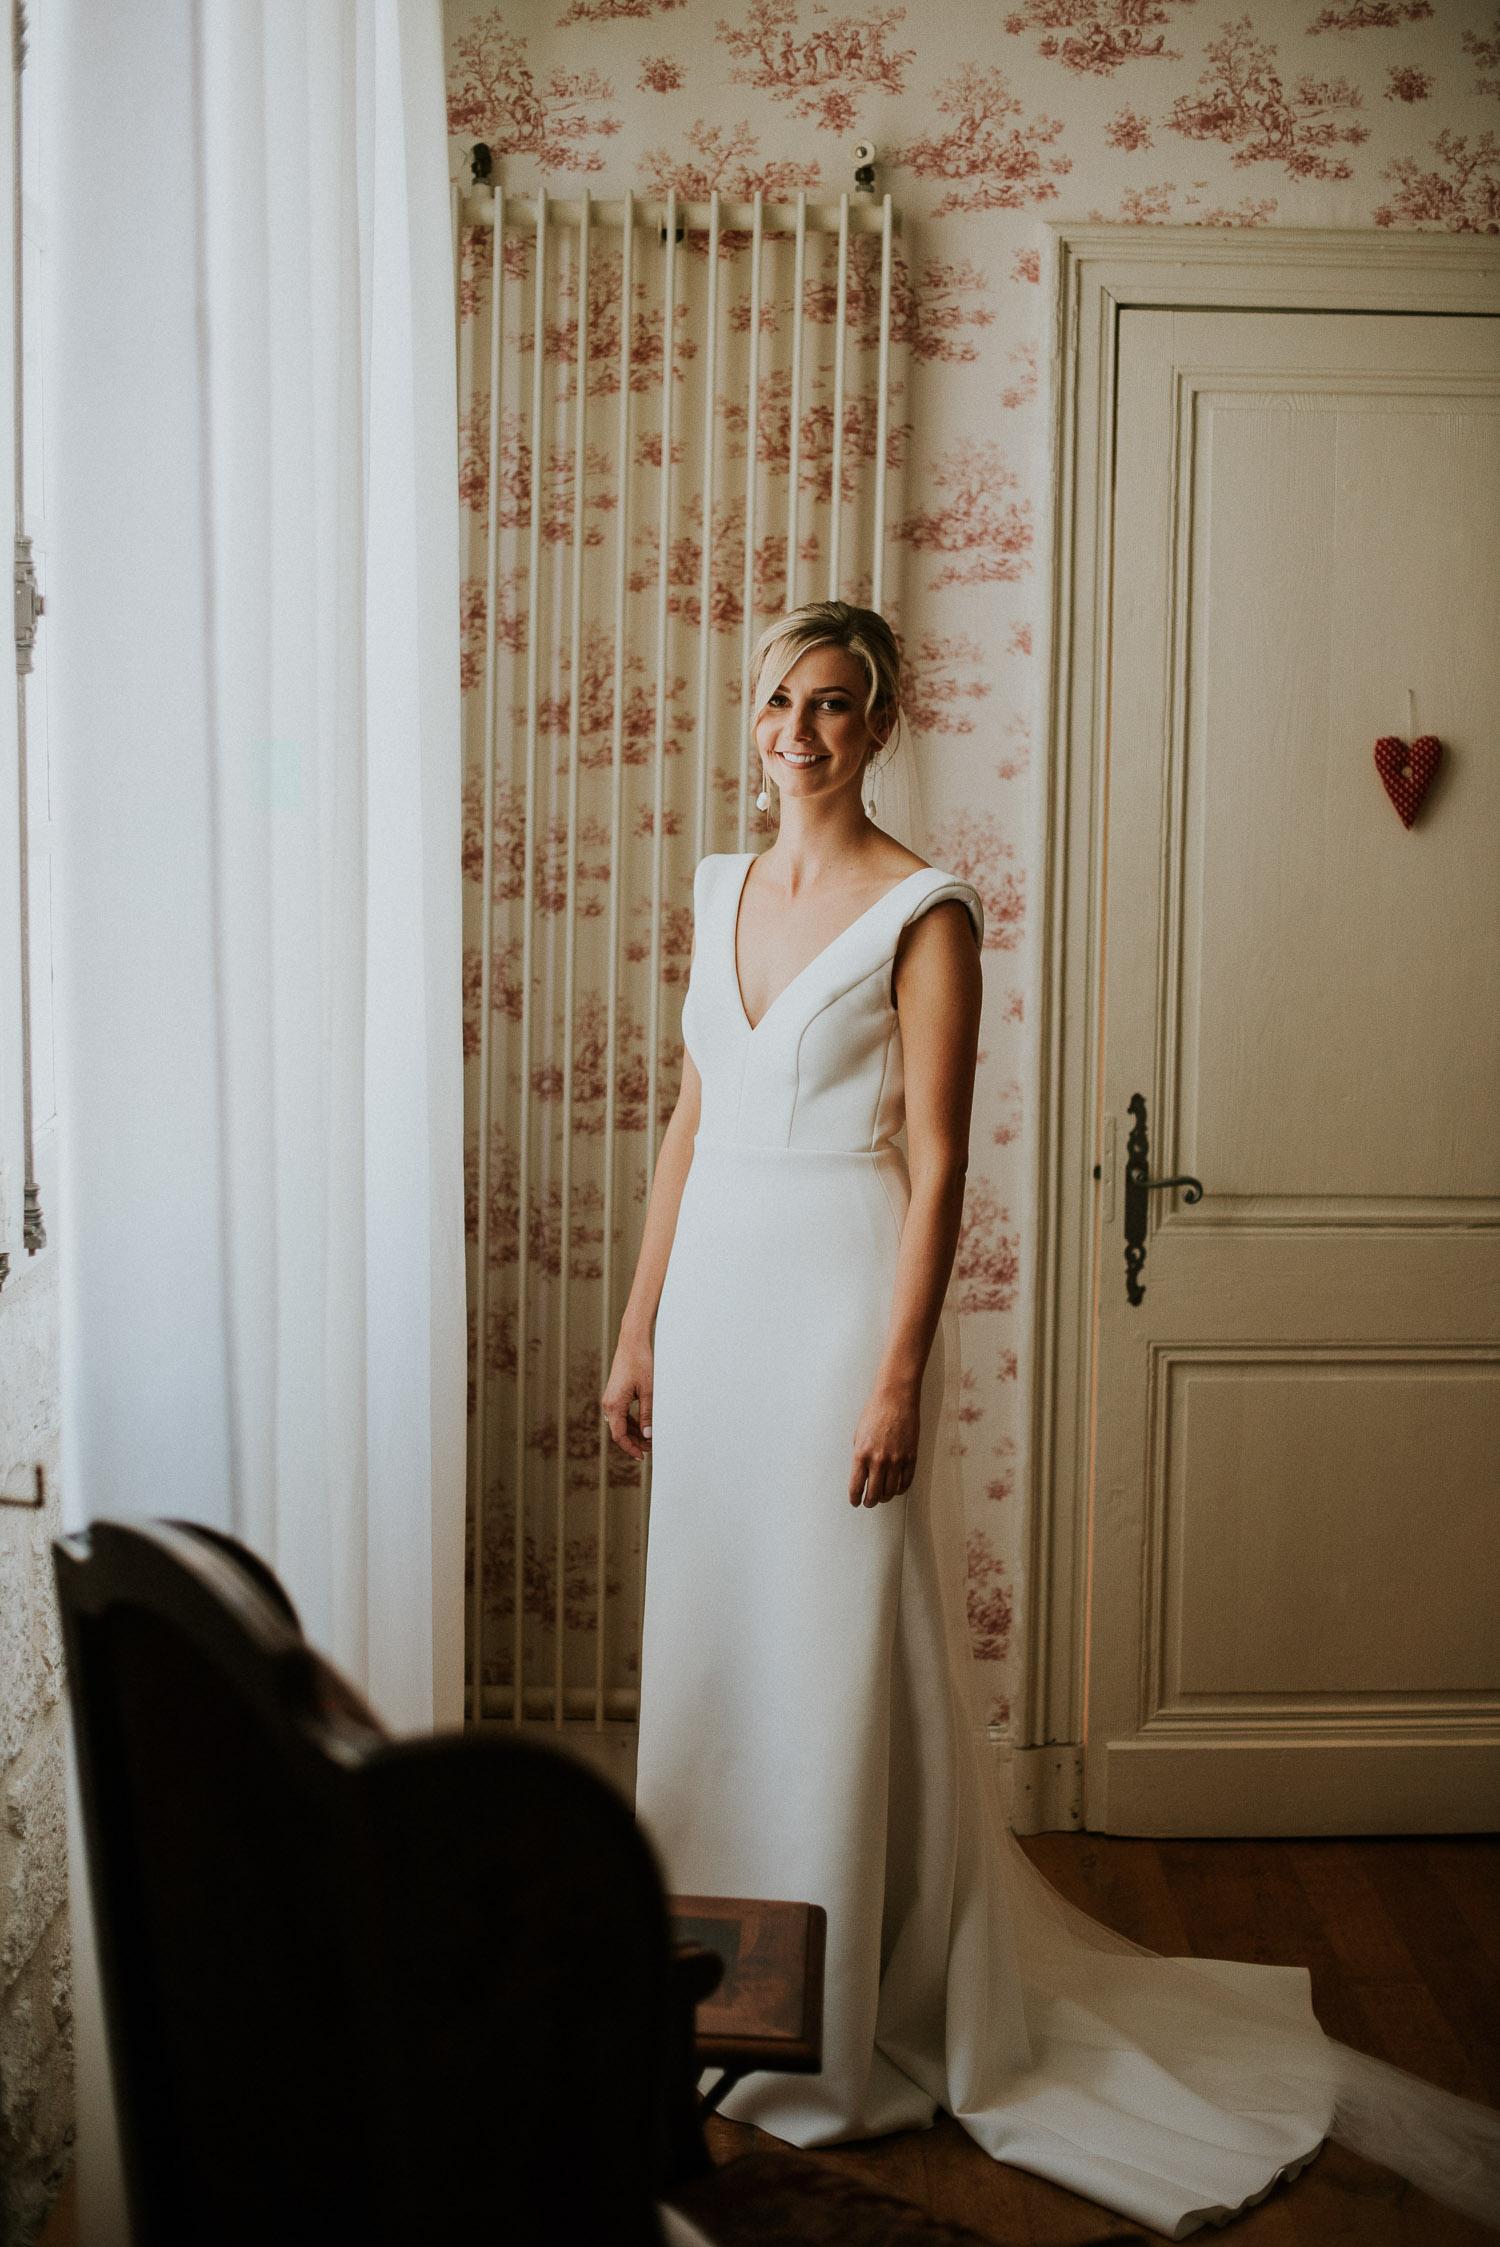 dordogne_eymet_wedding_france_katy_webb_photography_france_UK23